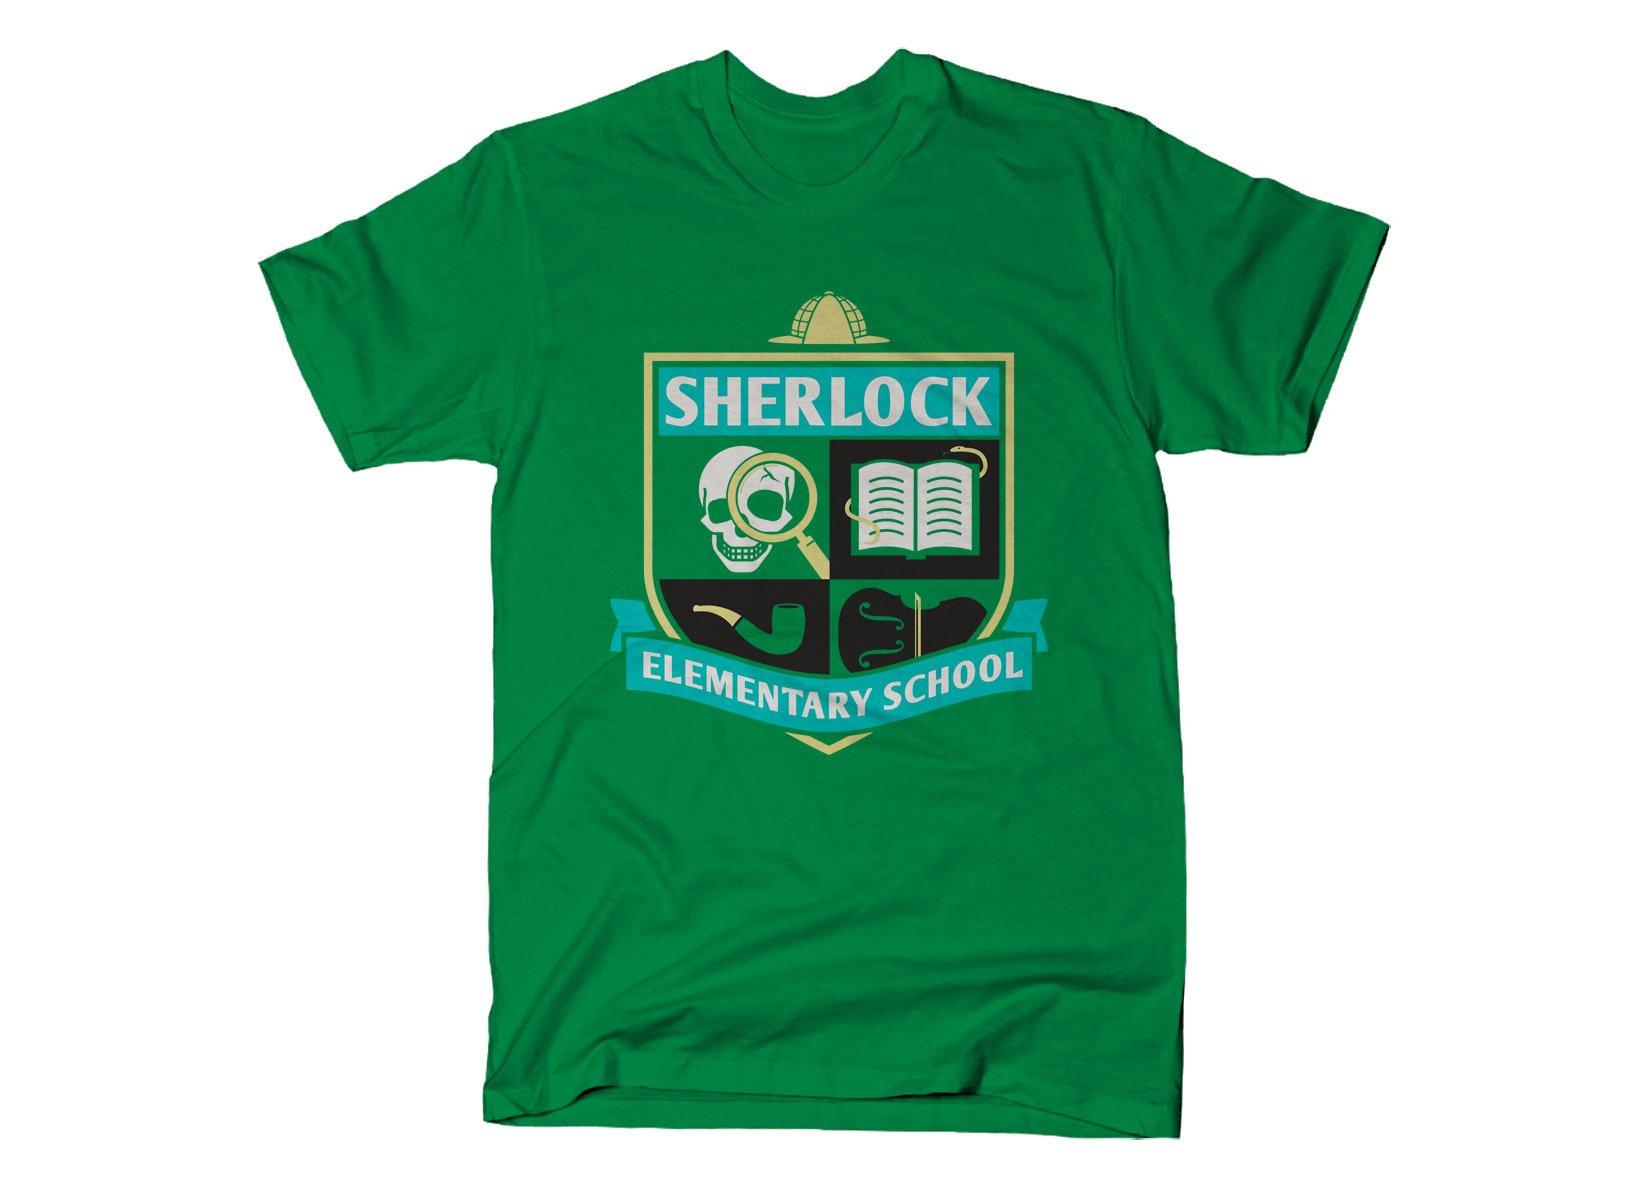 Sherlock Elementary School on Mens T-Shirt